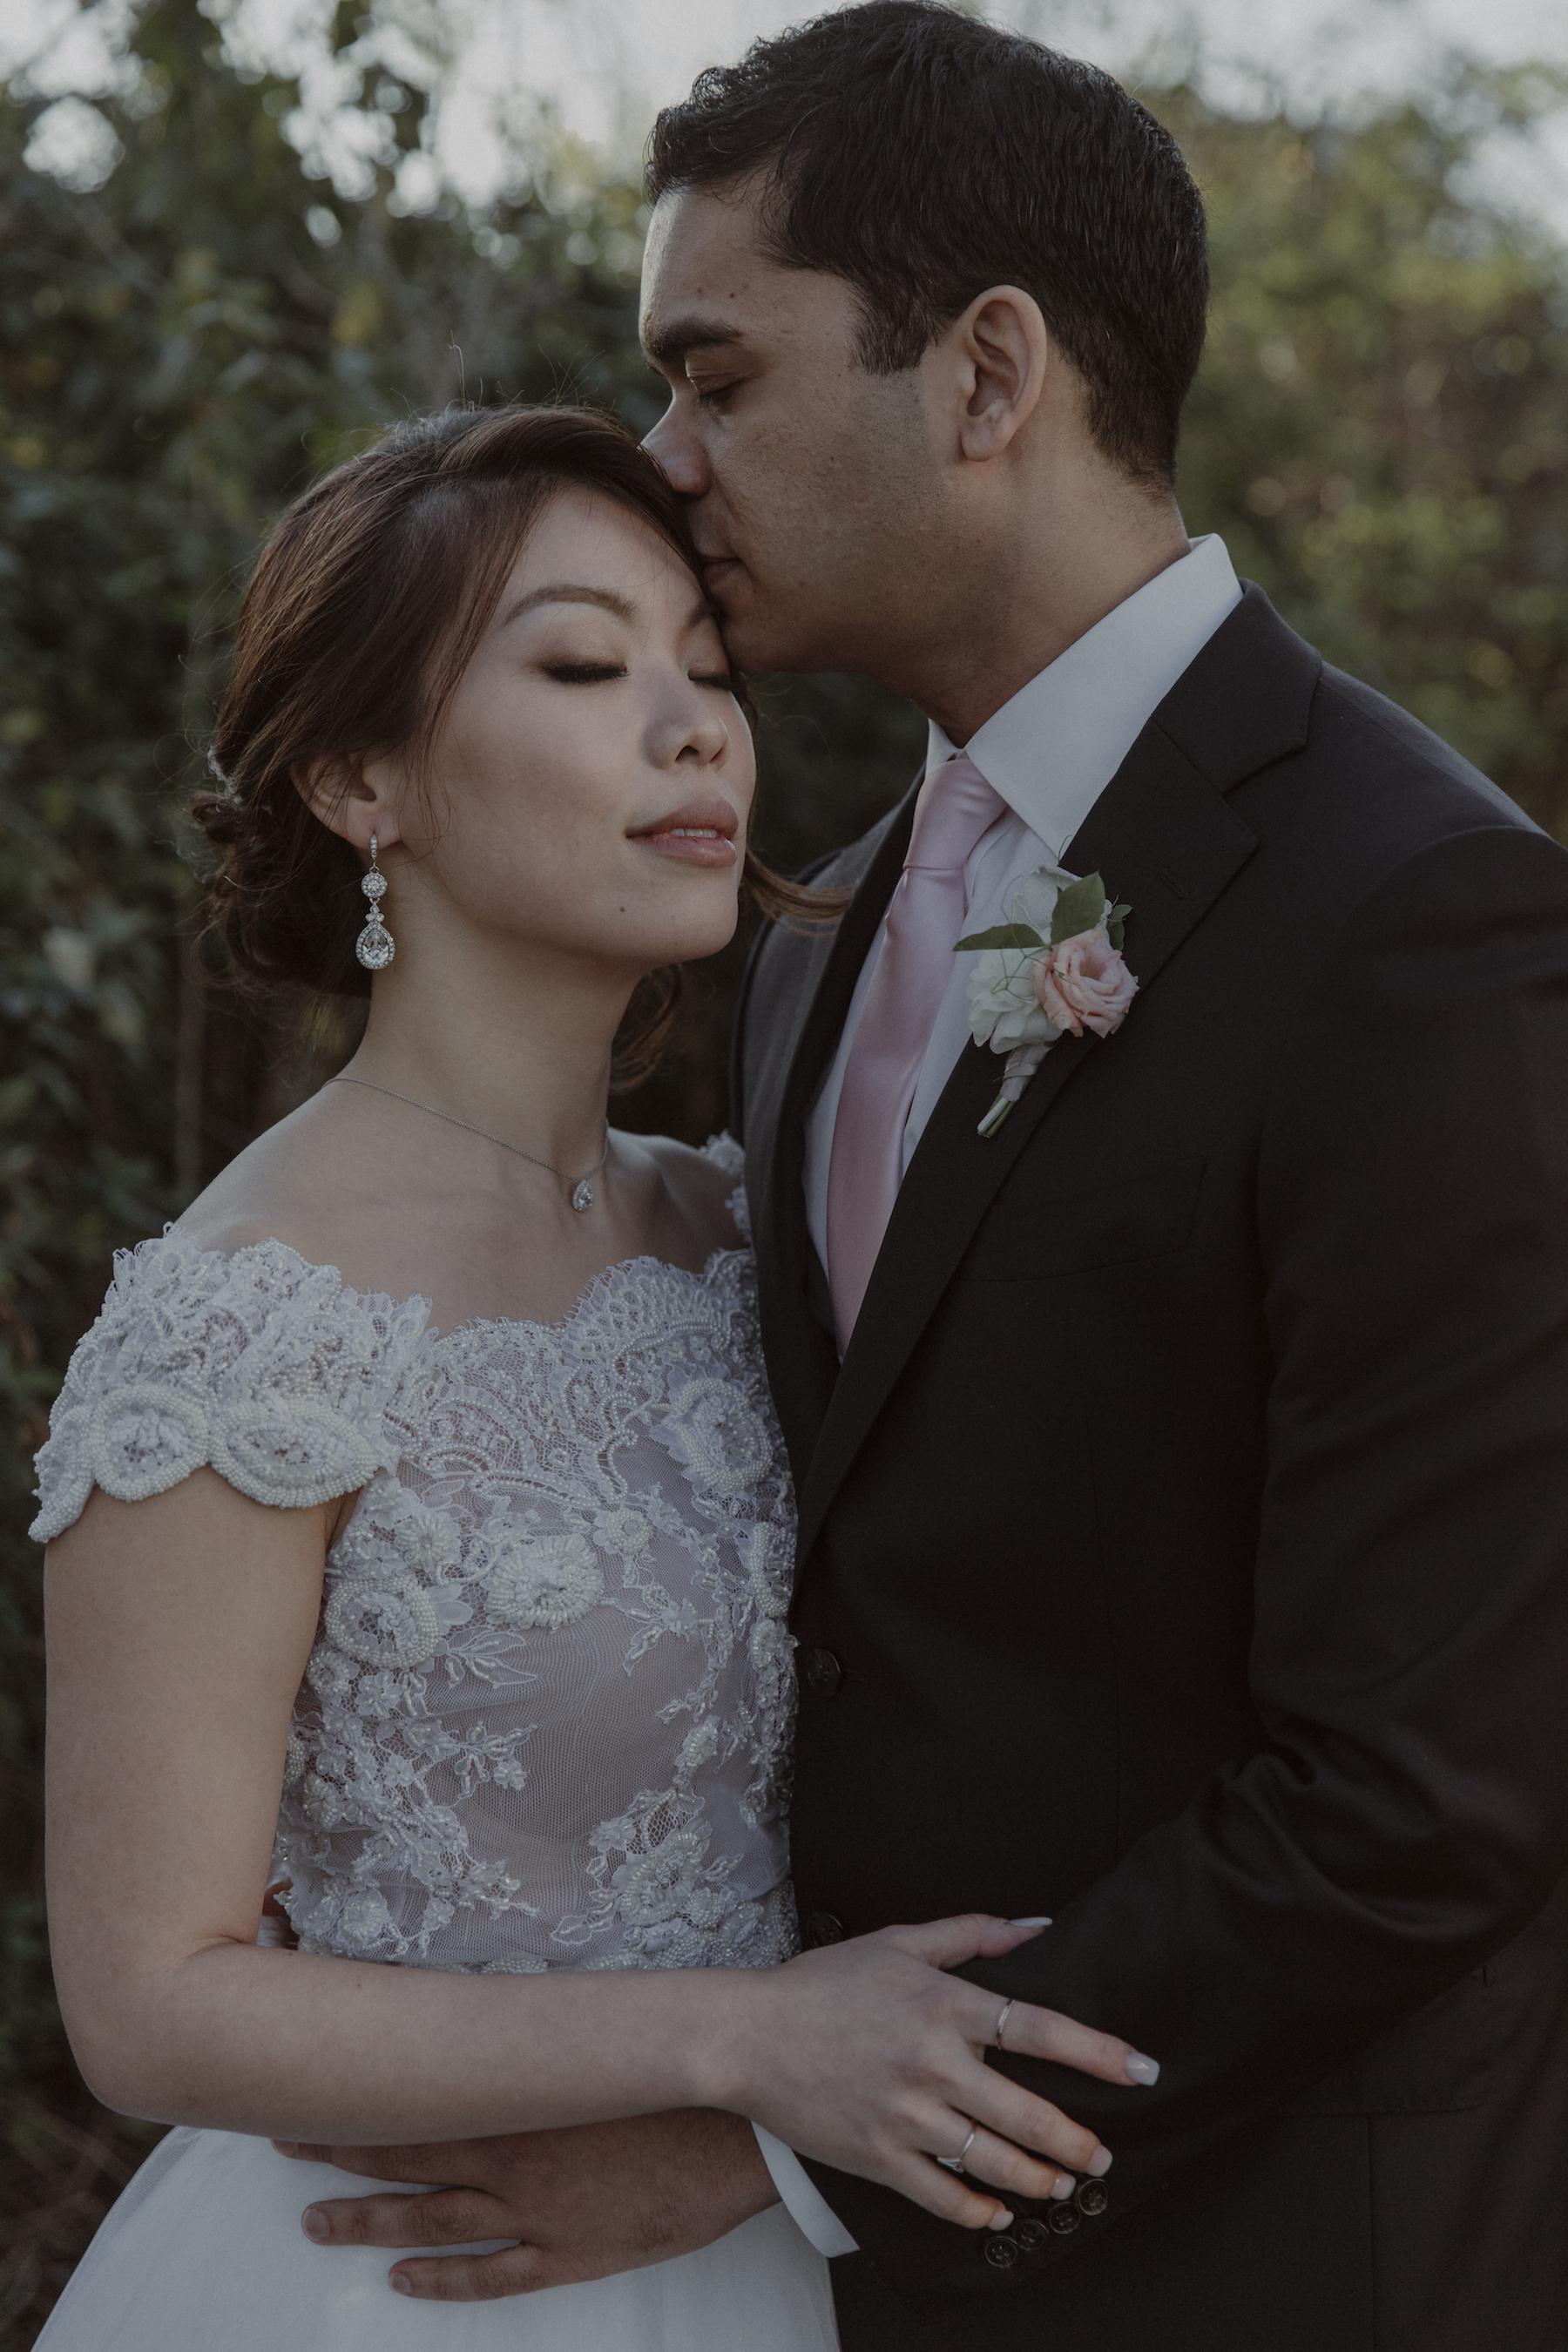 barr-mansion-wedding-austin-texas8882.JPG